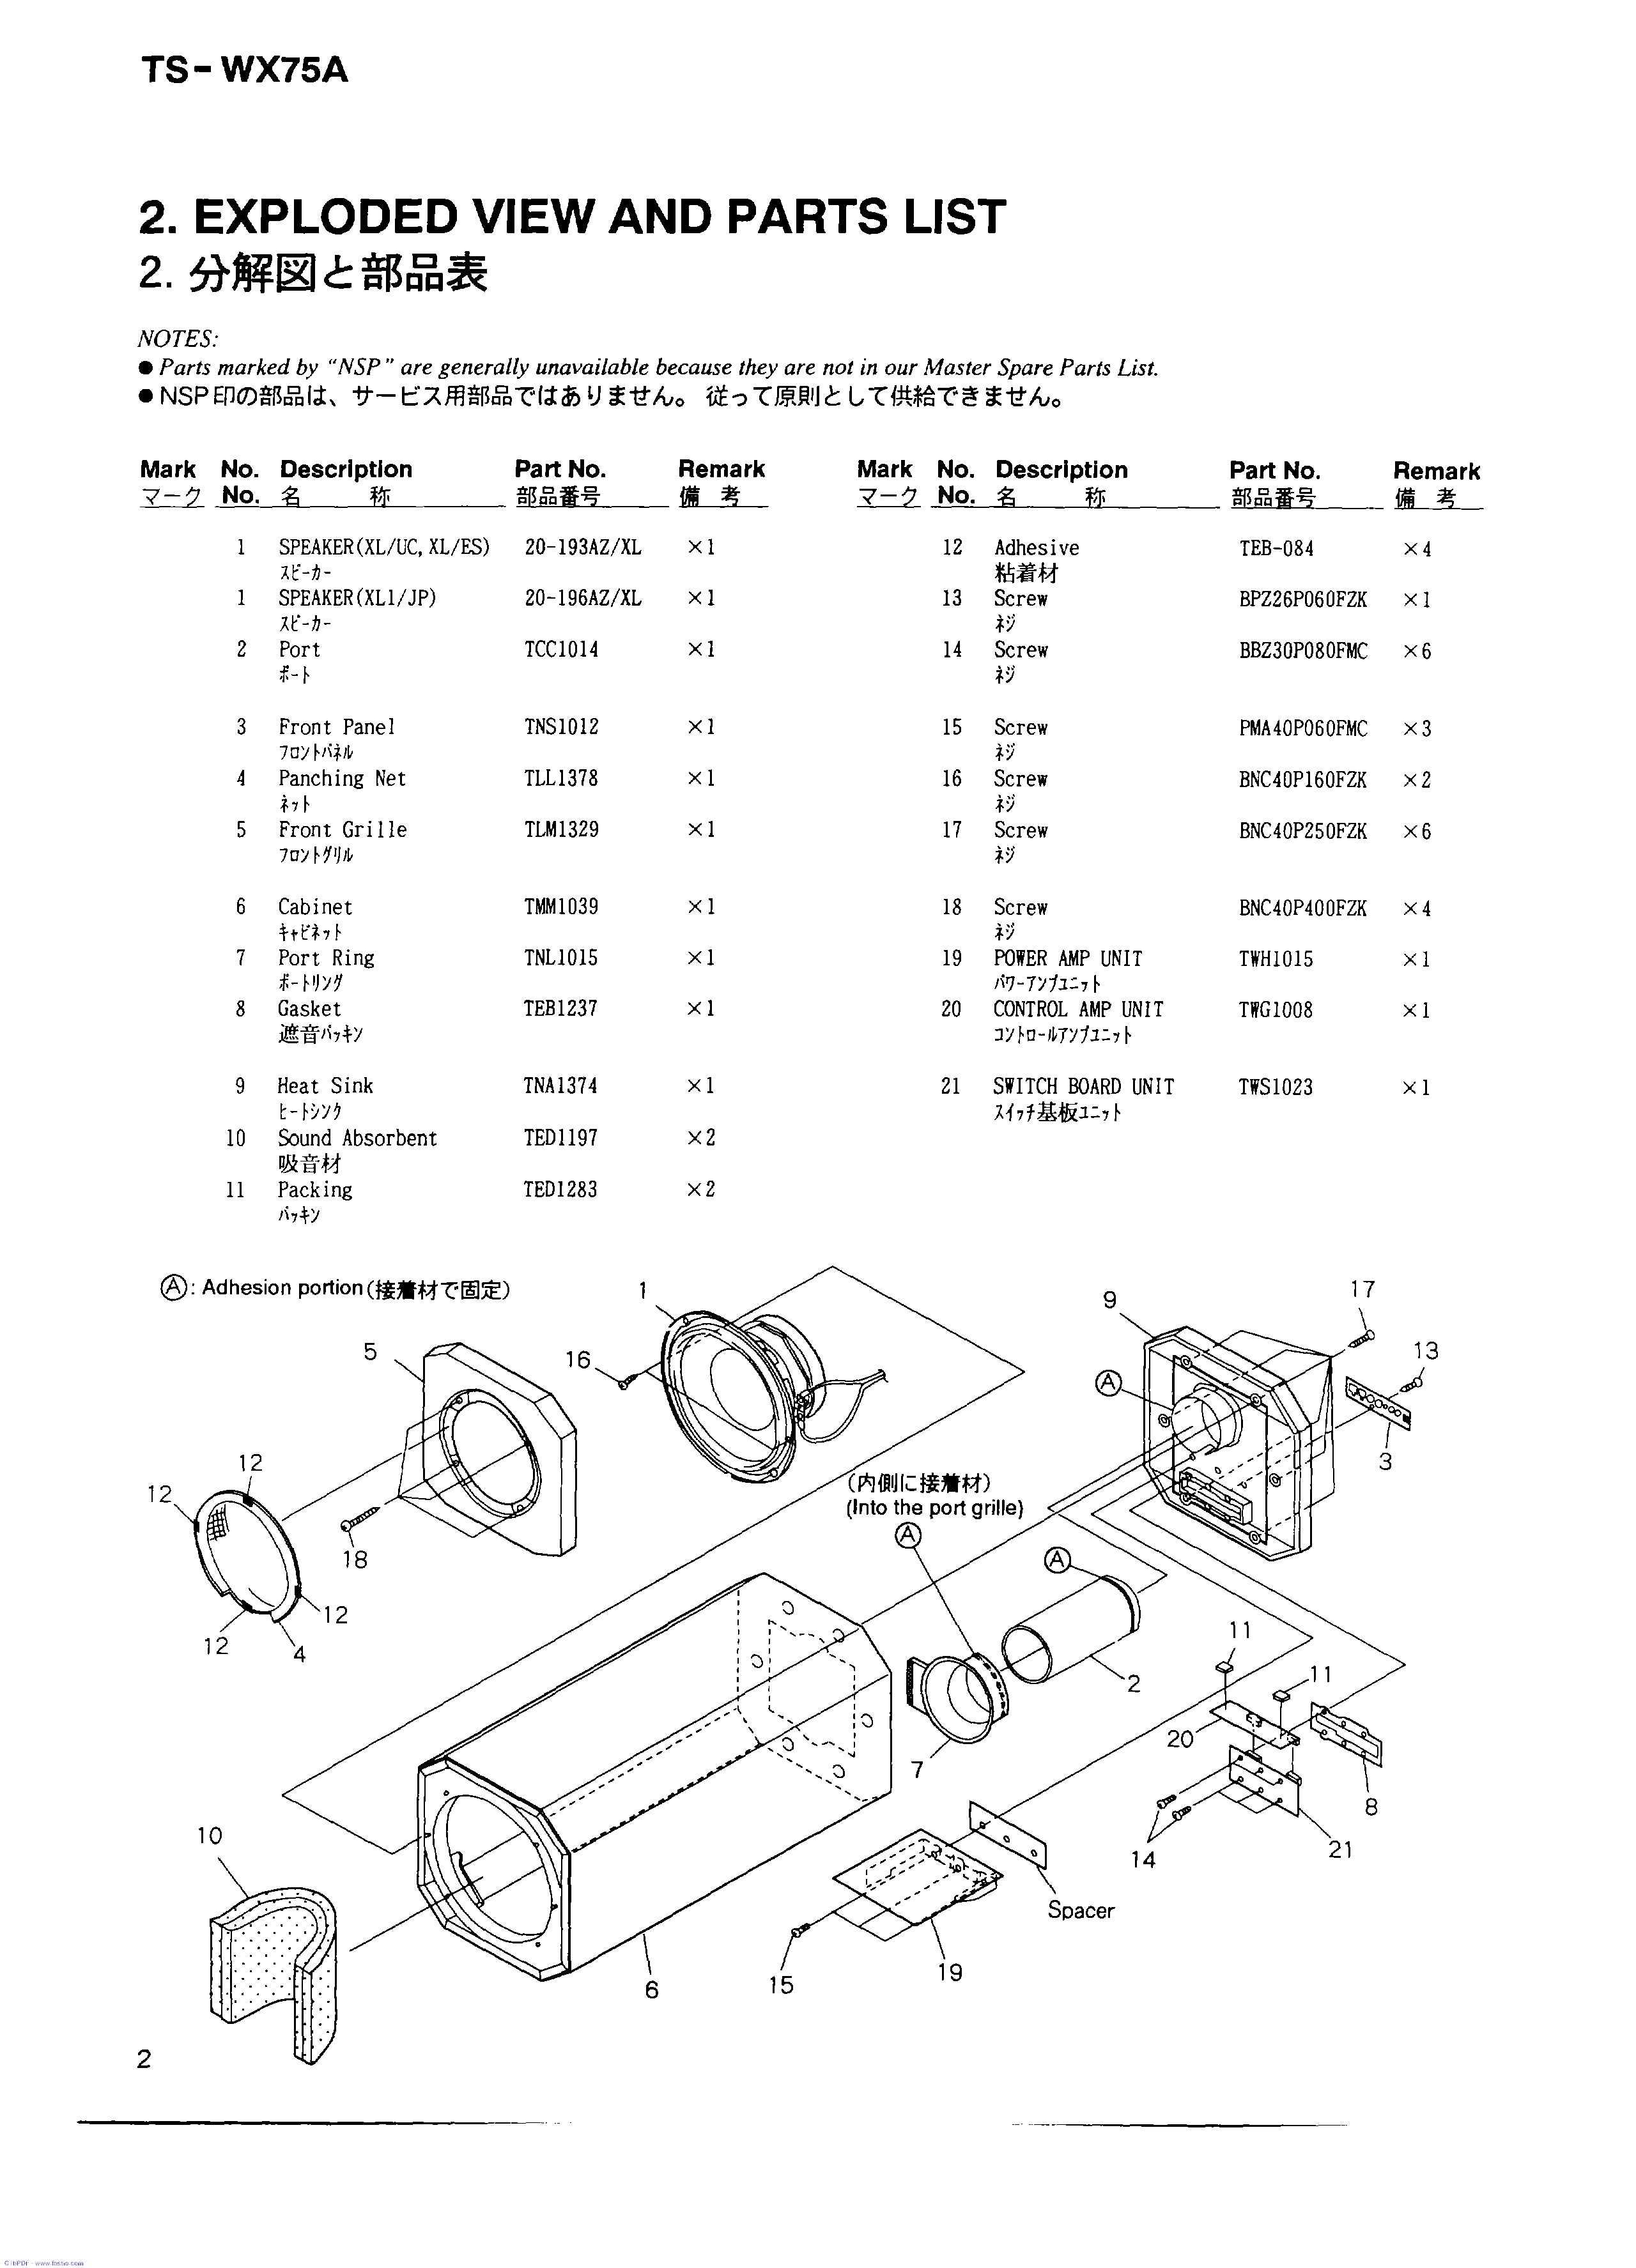 Pioneer ts-wx75a схема